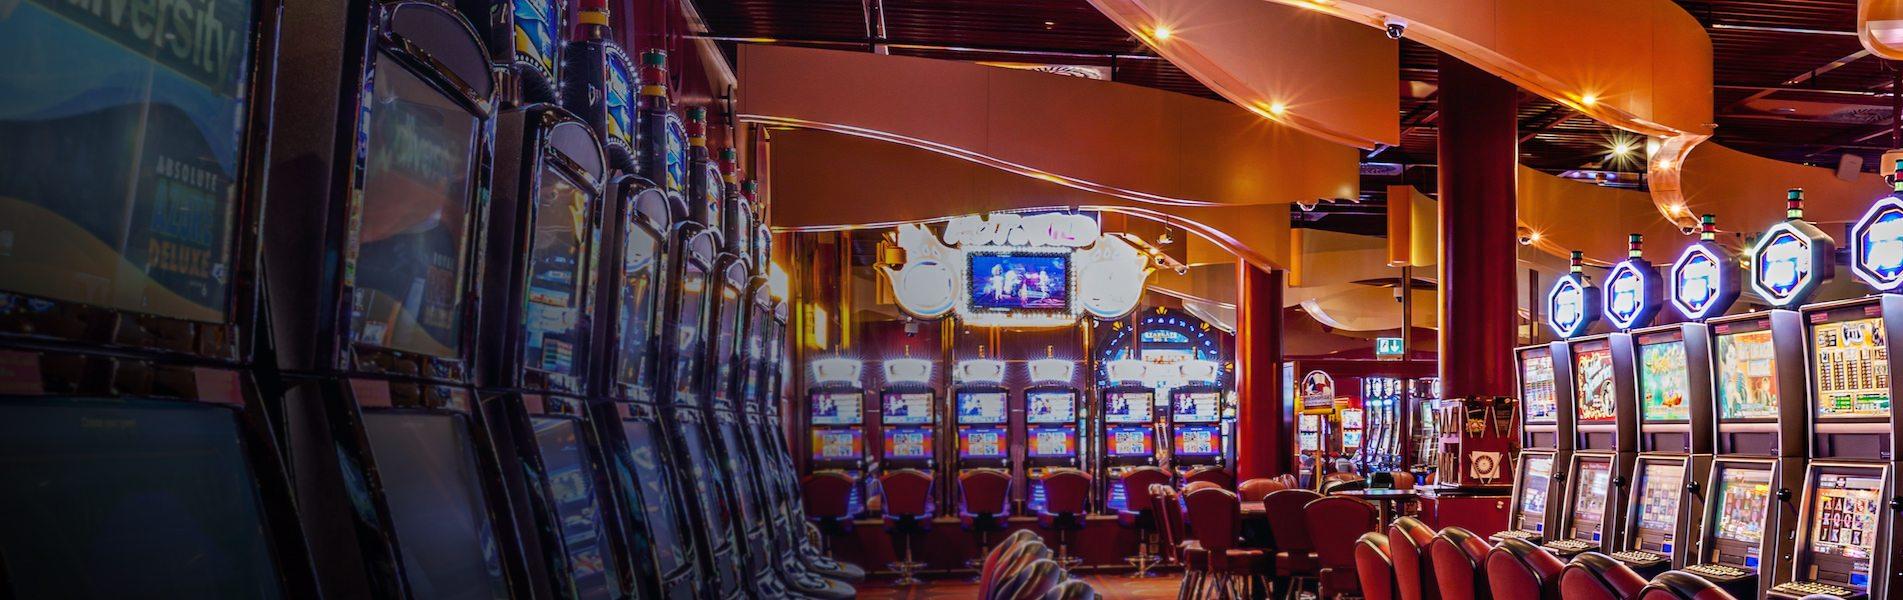 jackpot junction casino hotel monticello mn